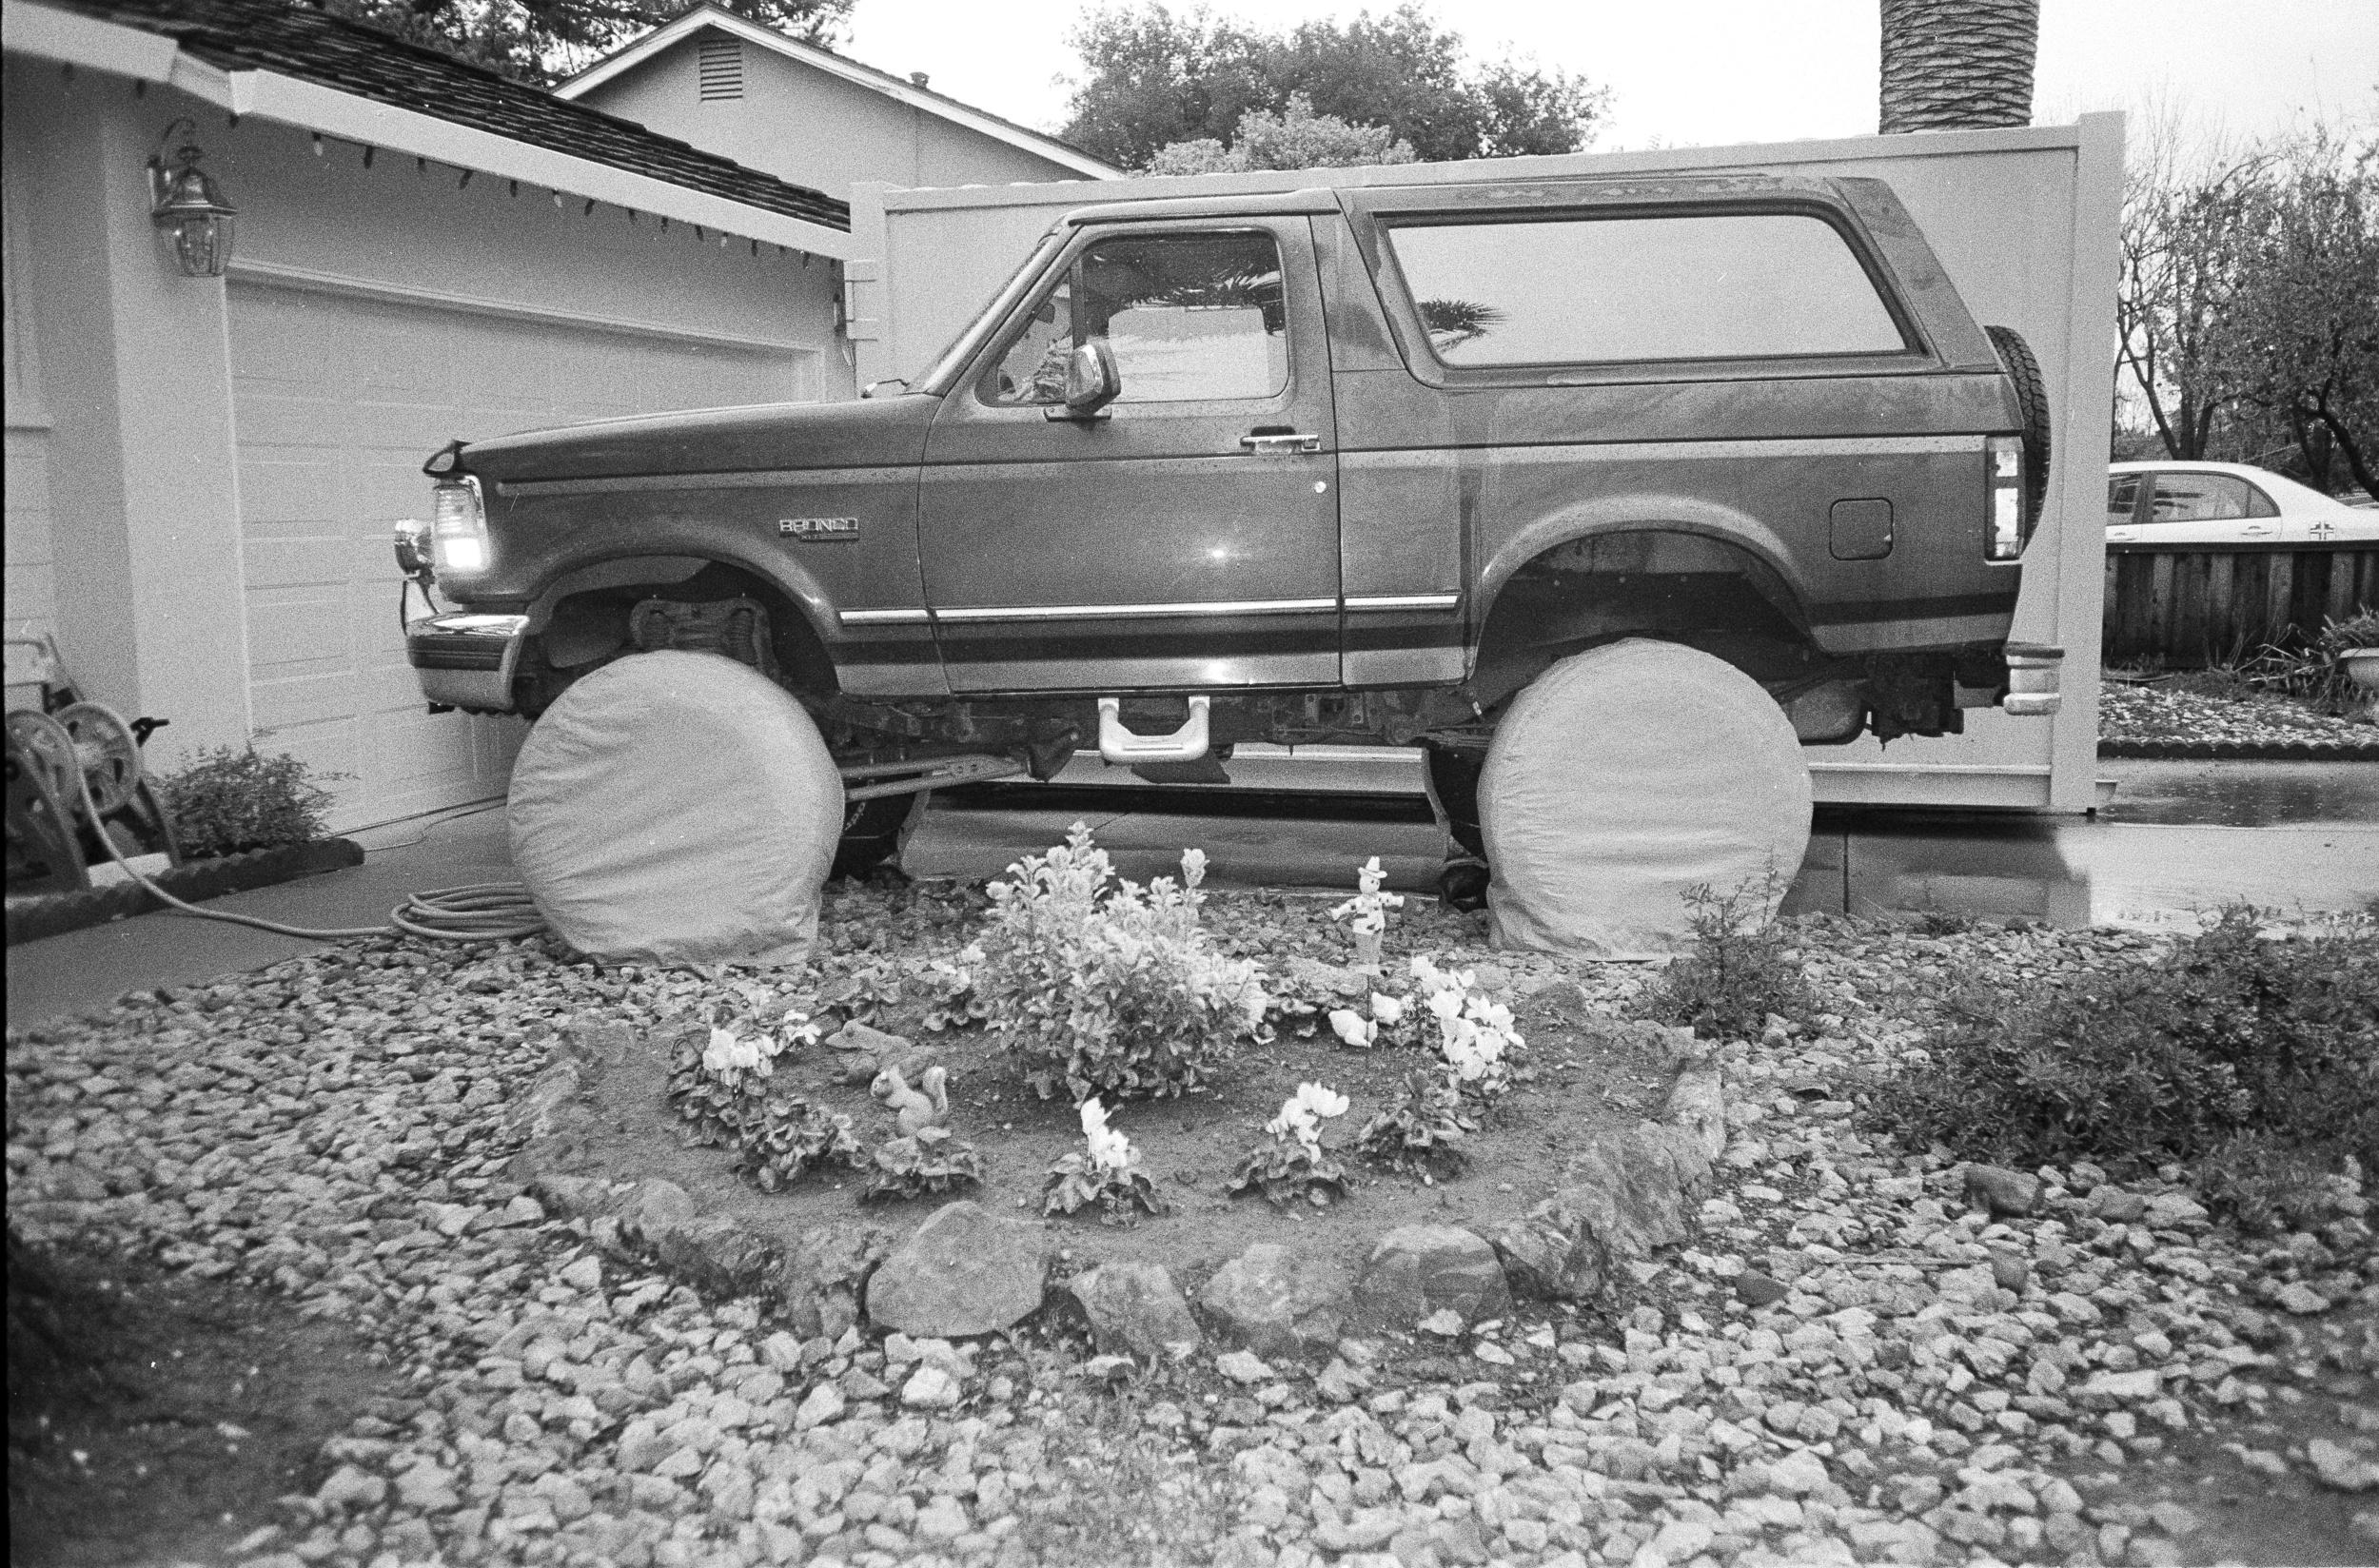 Truckw:ShoesJustinesNeighbor copy.jpg